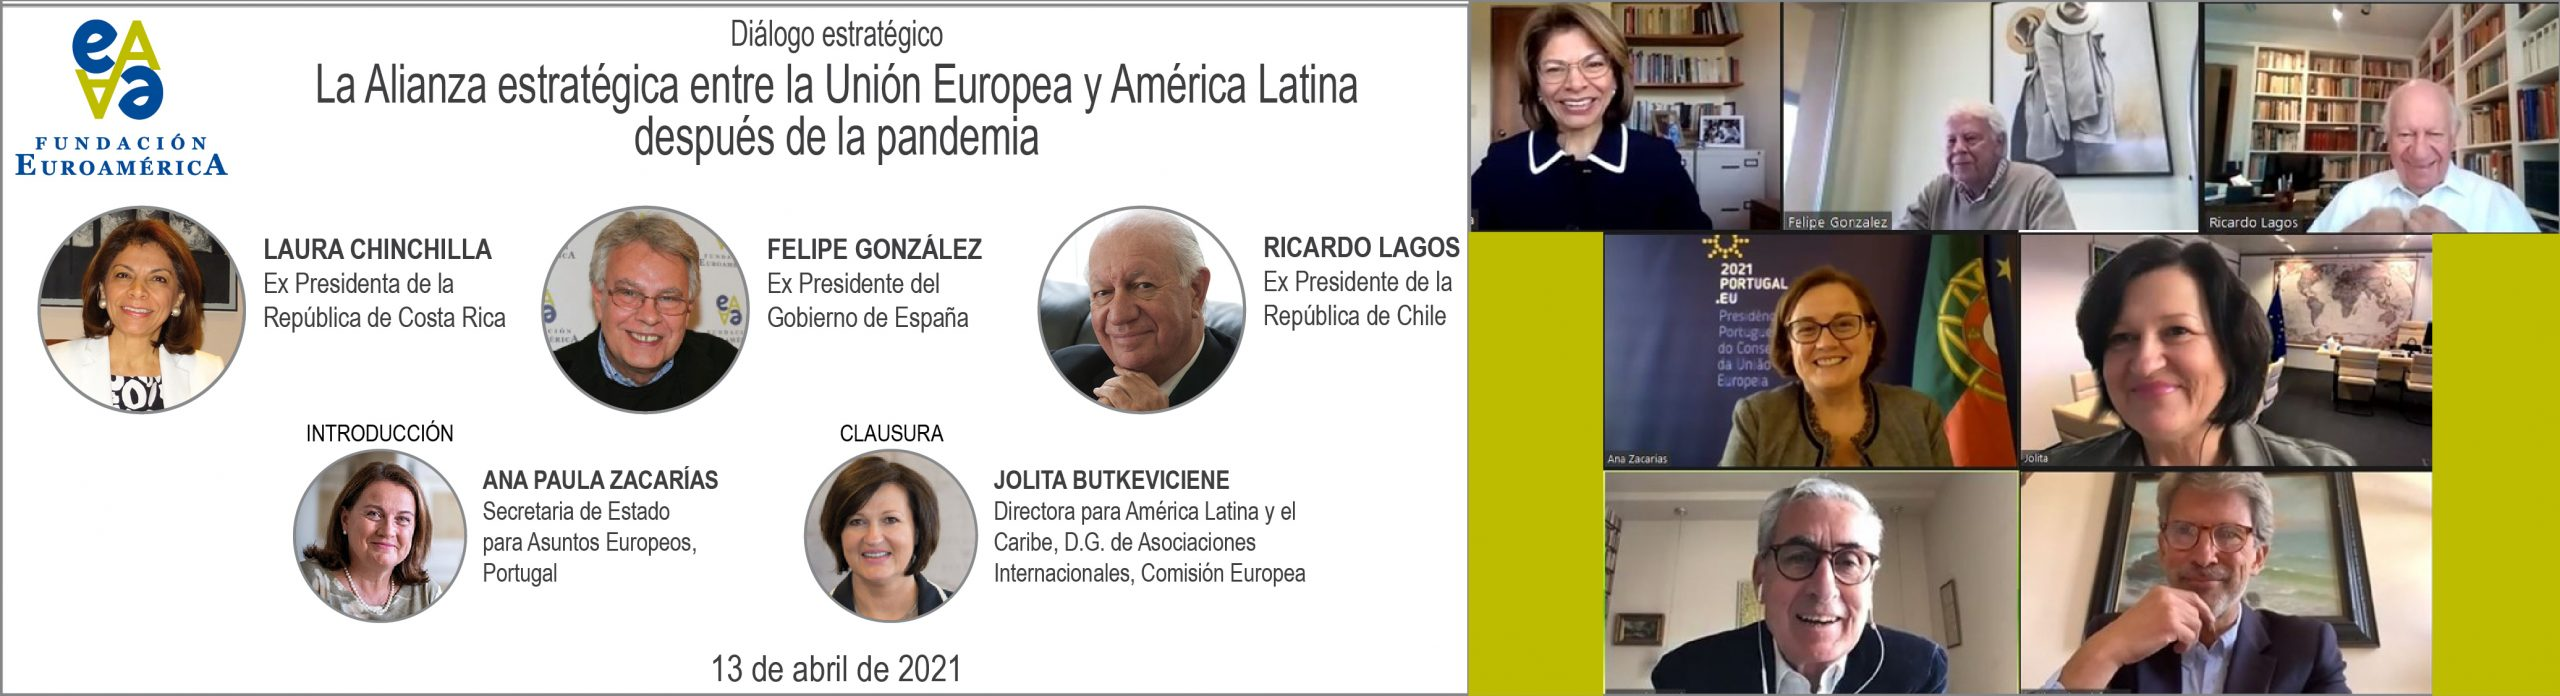 Diálogo estratégico: Chinchilla,González,Lagos